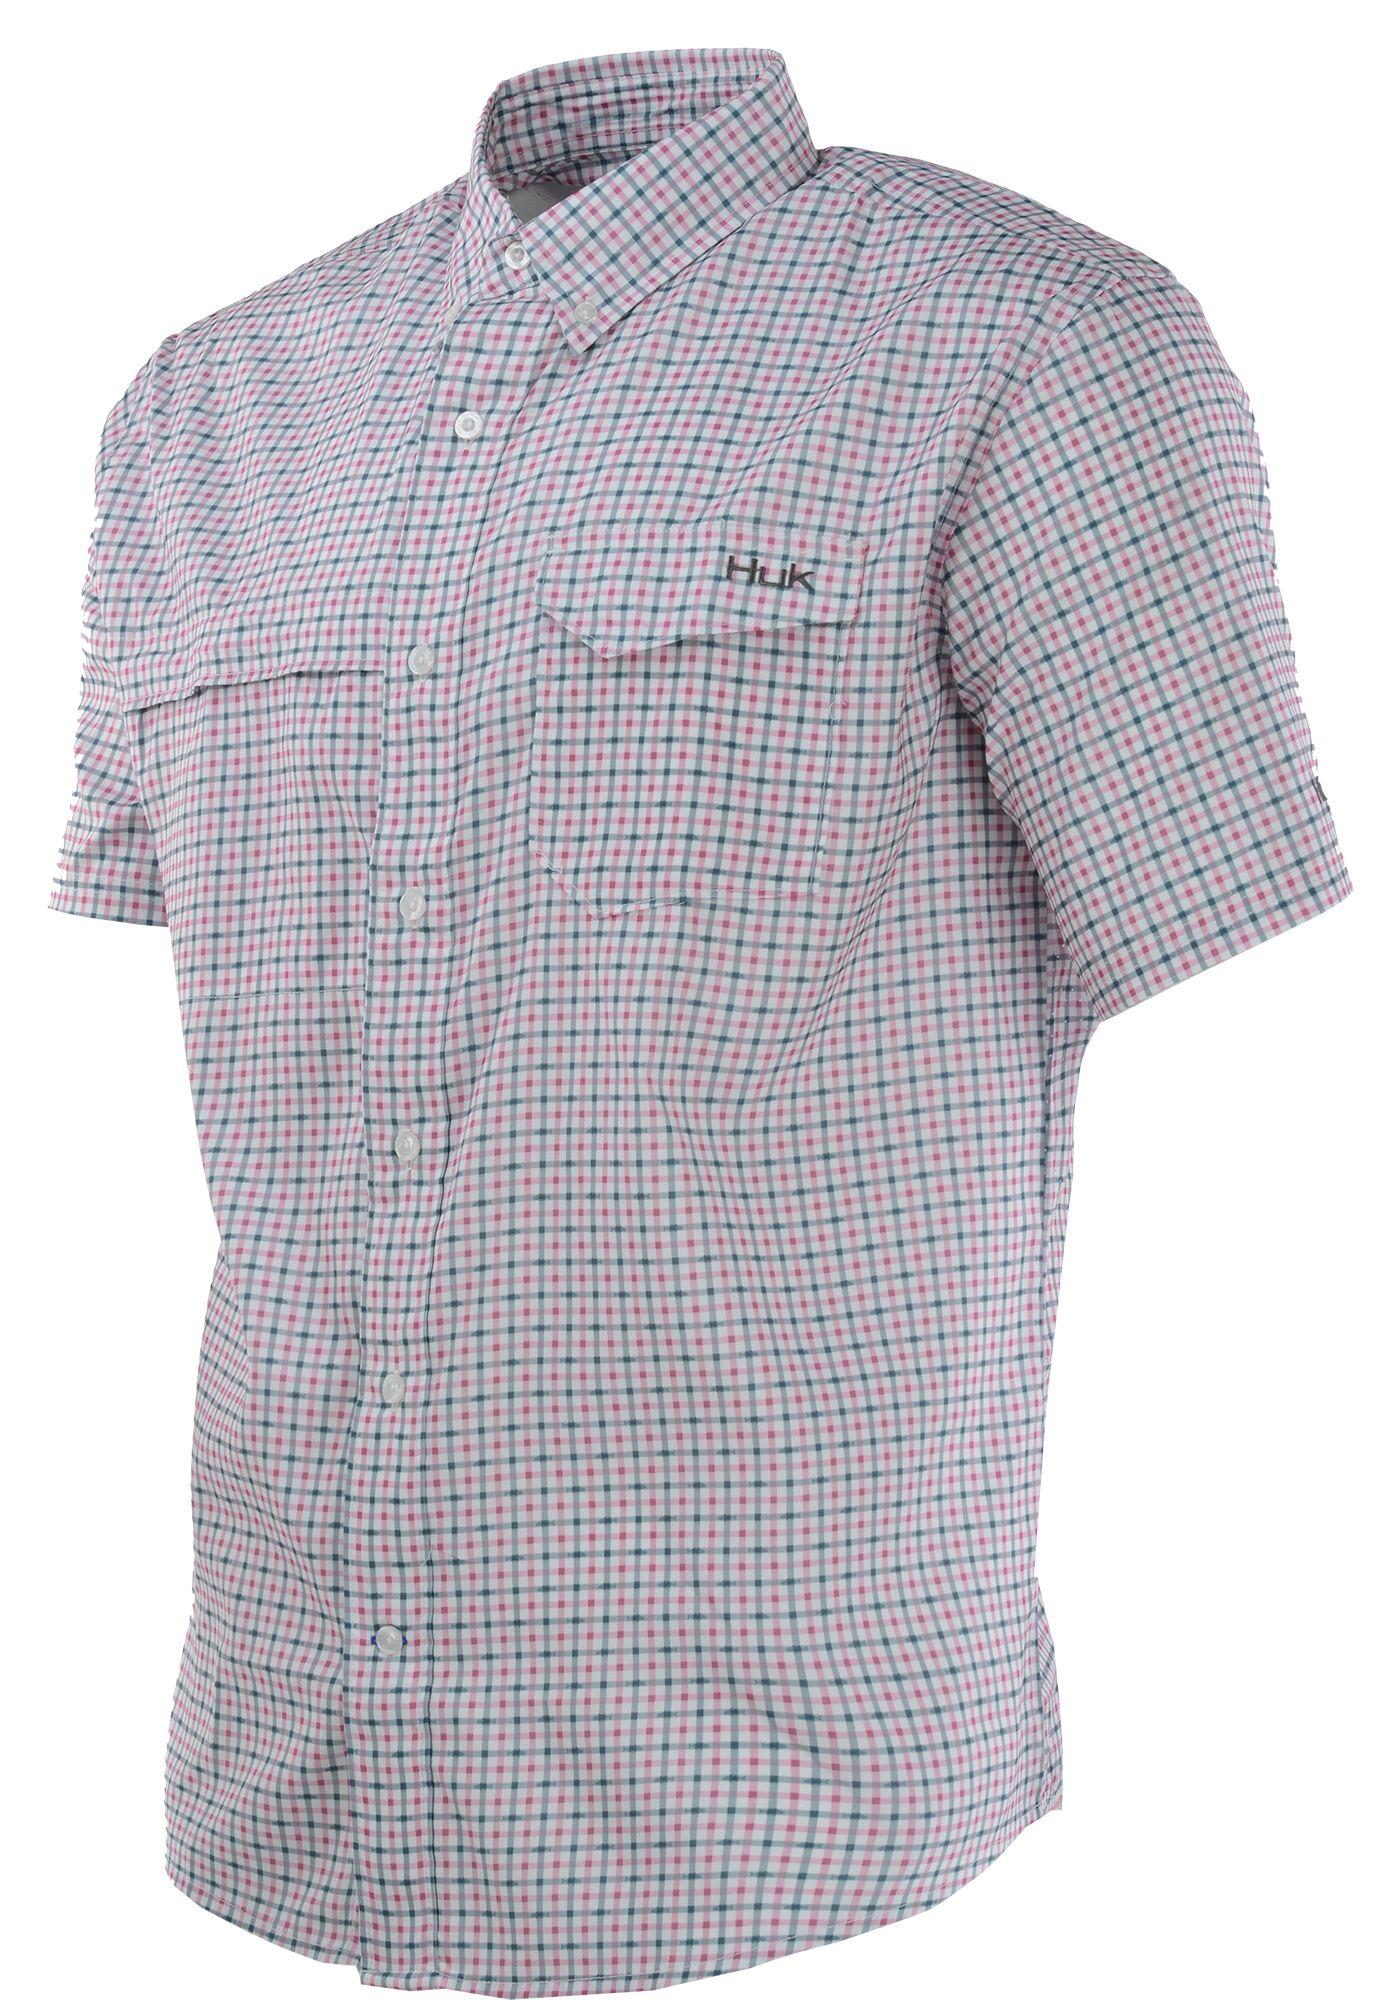 Huk Men's Tide Point Woven Plaid Short Sleeve Button Down Shirt